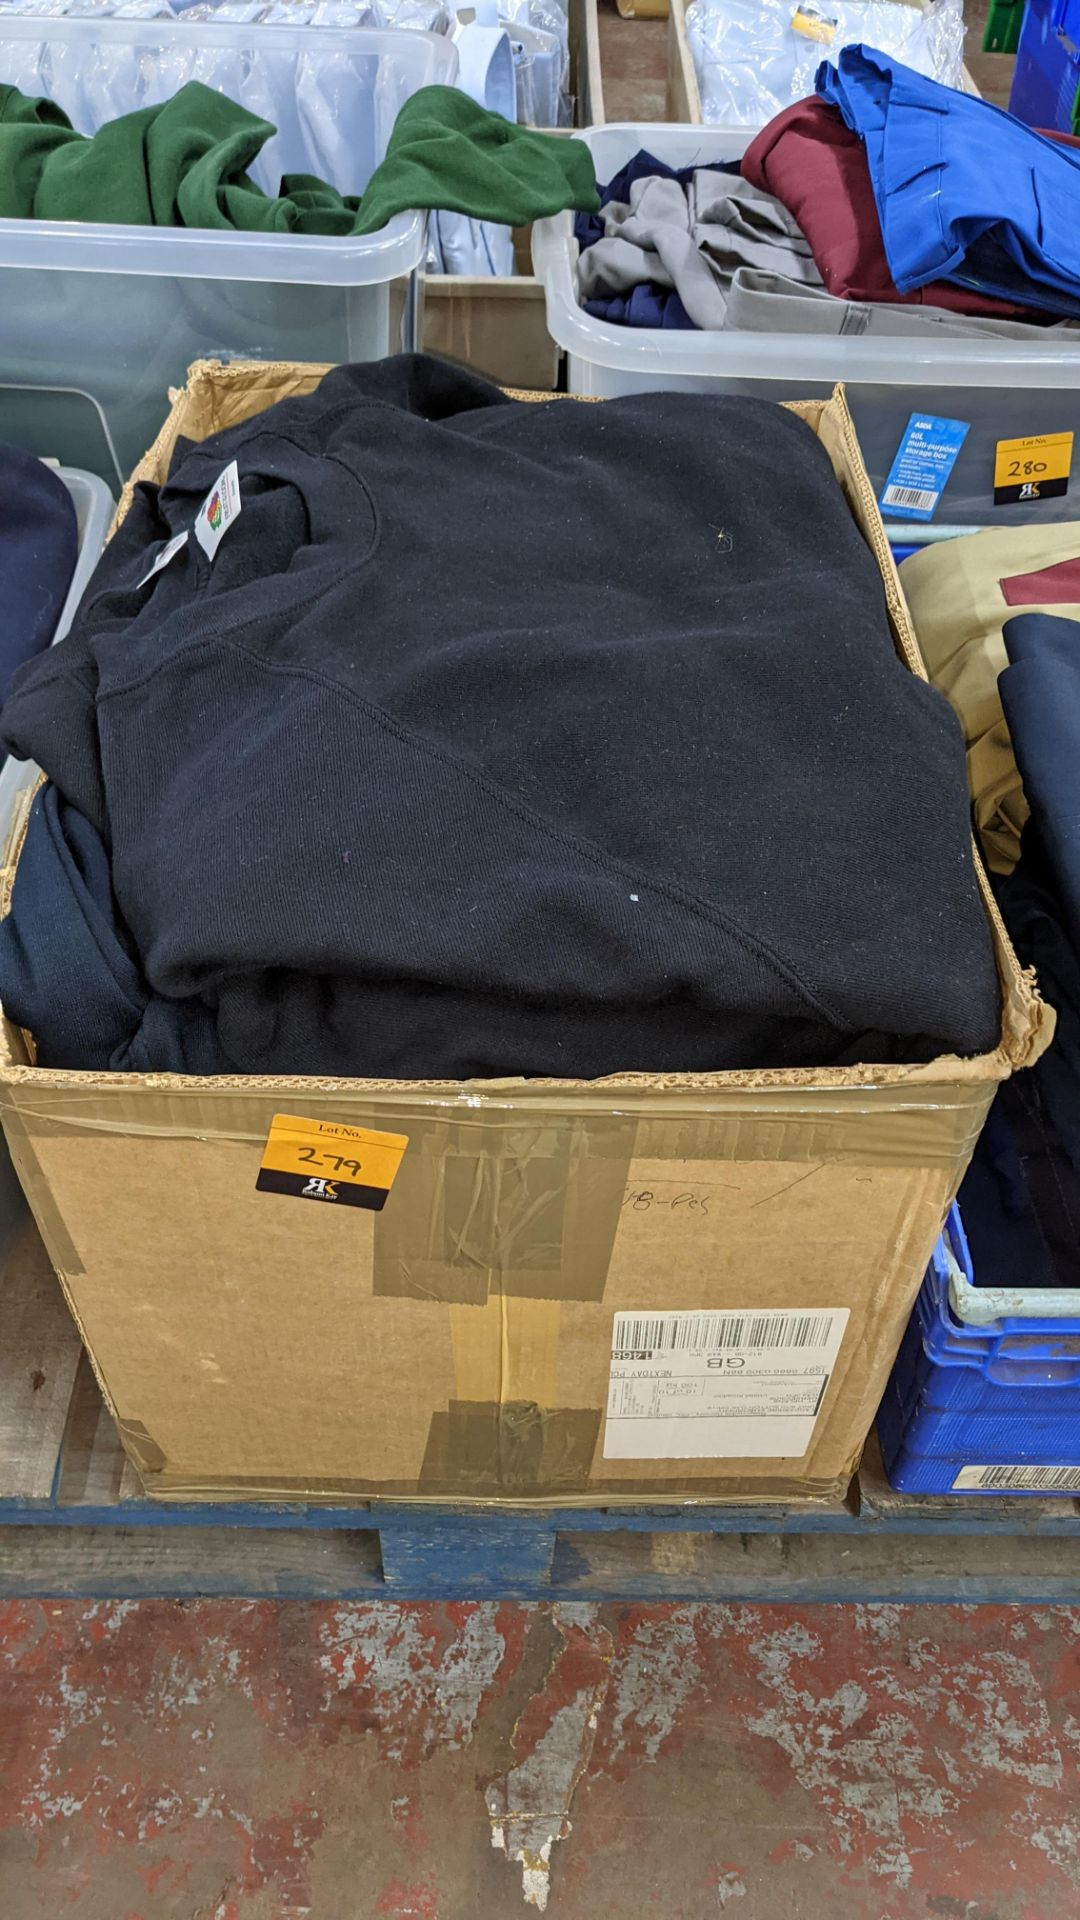 Quantity of black sweatshirts - 1 large box